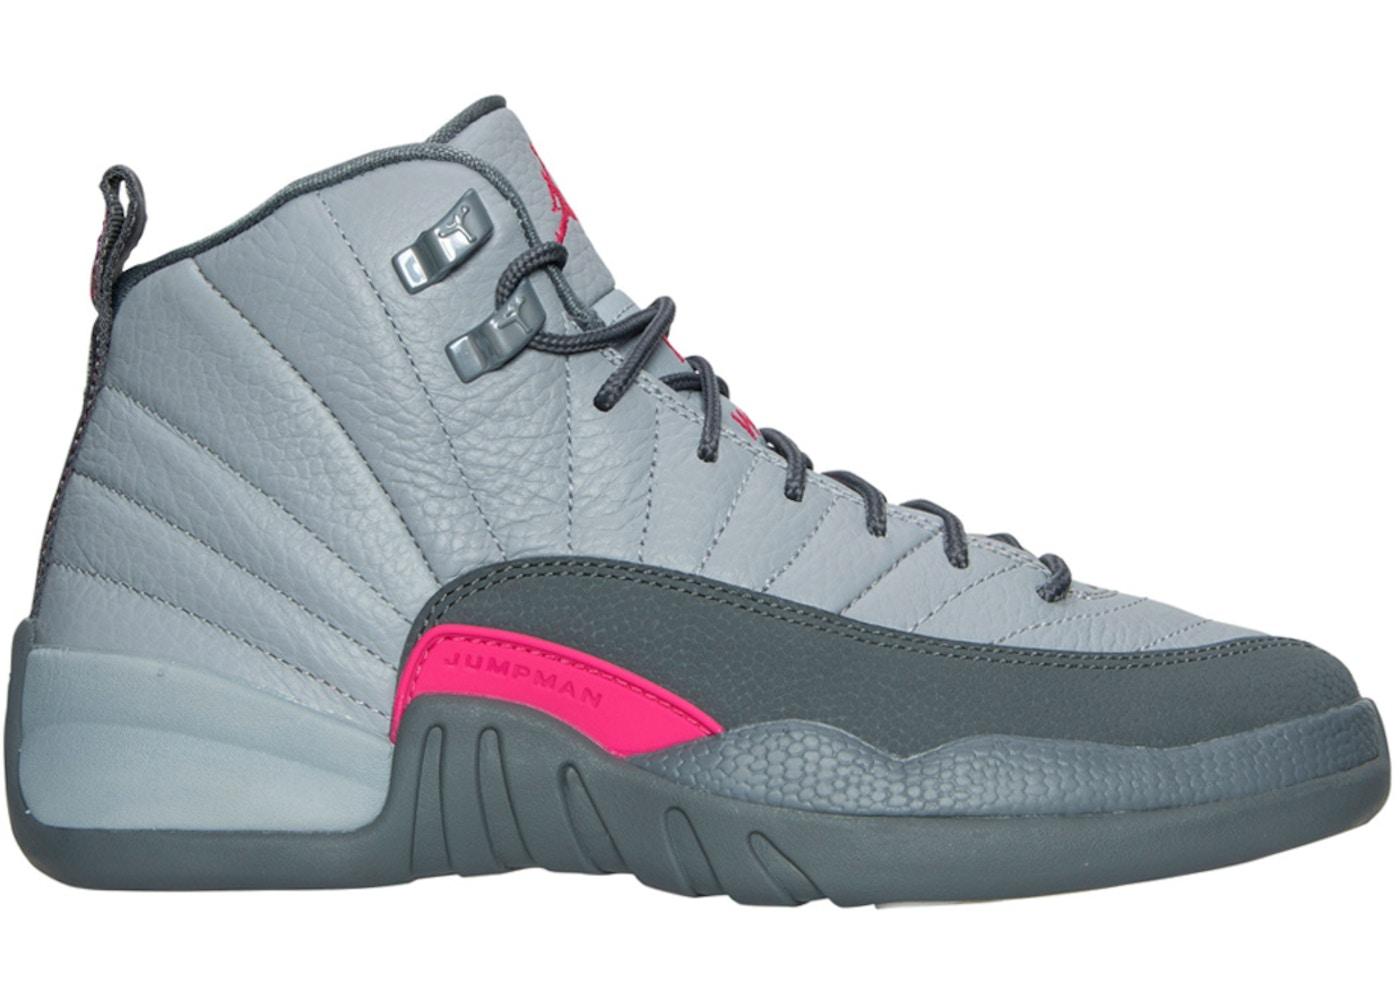 ed6c9515031a Jordan 12 Retro Wolf Grey Vivid Pink (GS) - 510815-029